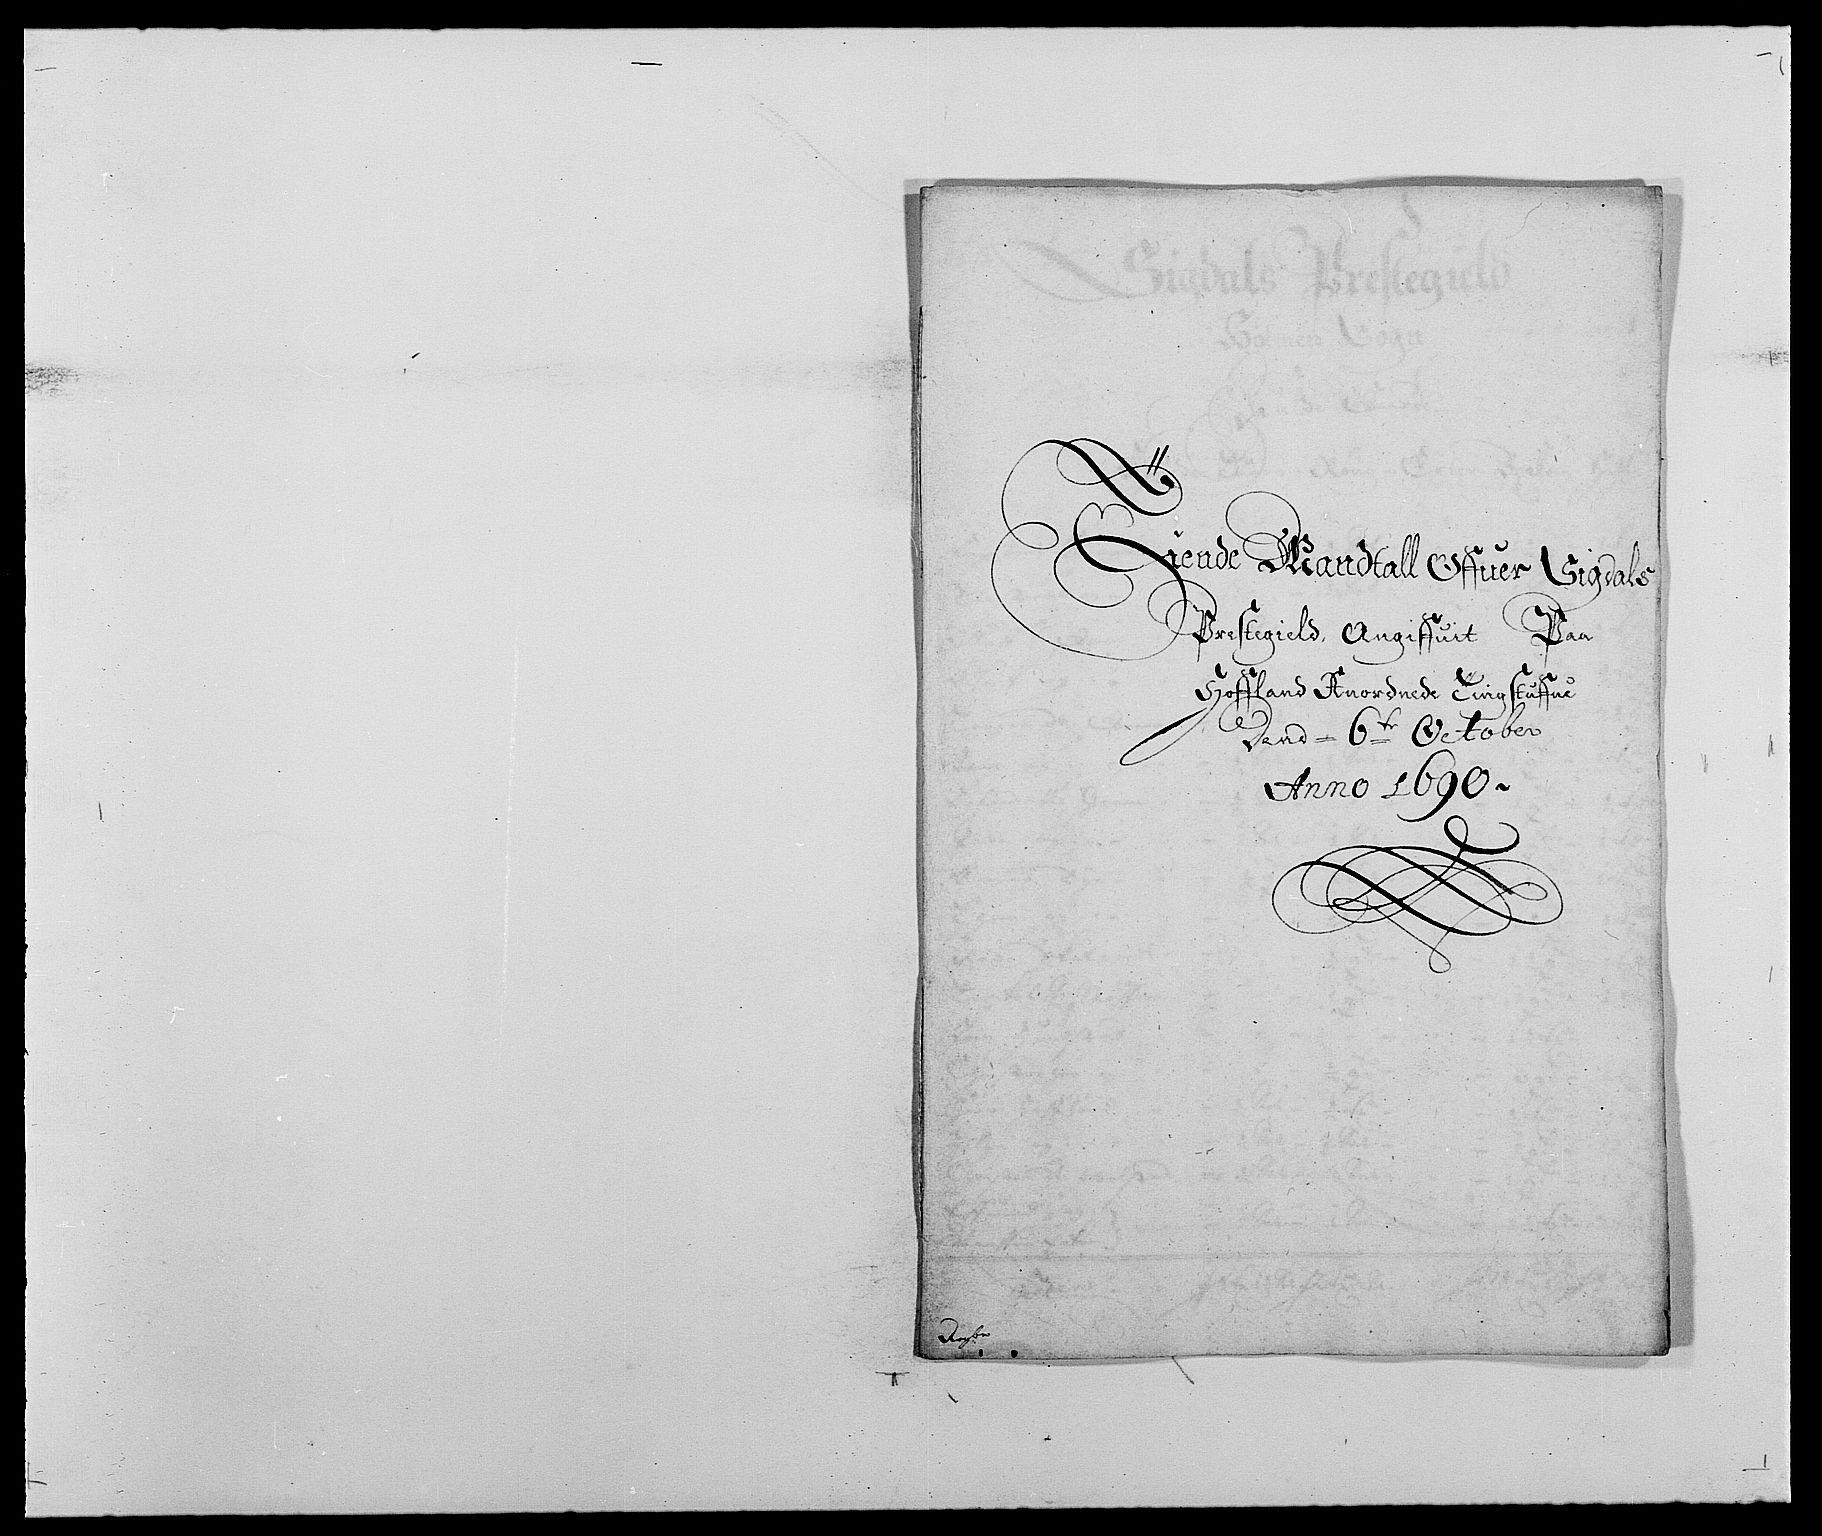 RA, Rentekammeret inntil 1814, Reviderte regnskaper, Fogderegnskap, R25/L1680: Fogderegnskap Buskerud, 1689-1690, s. 274